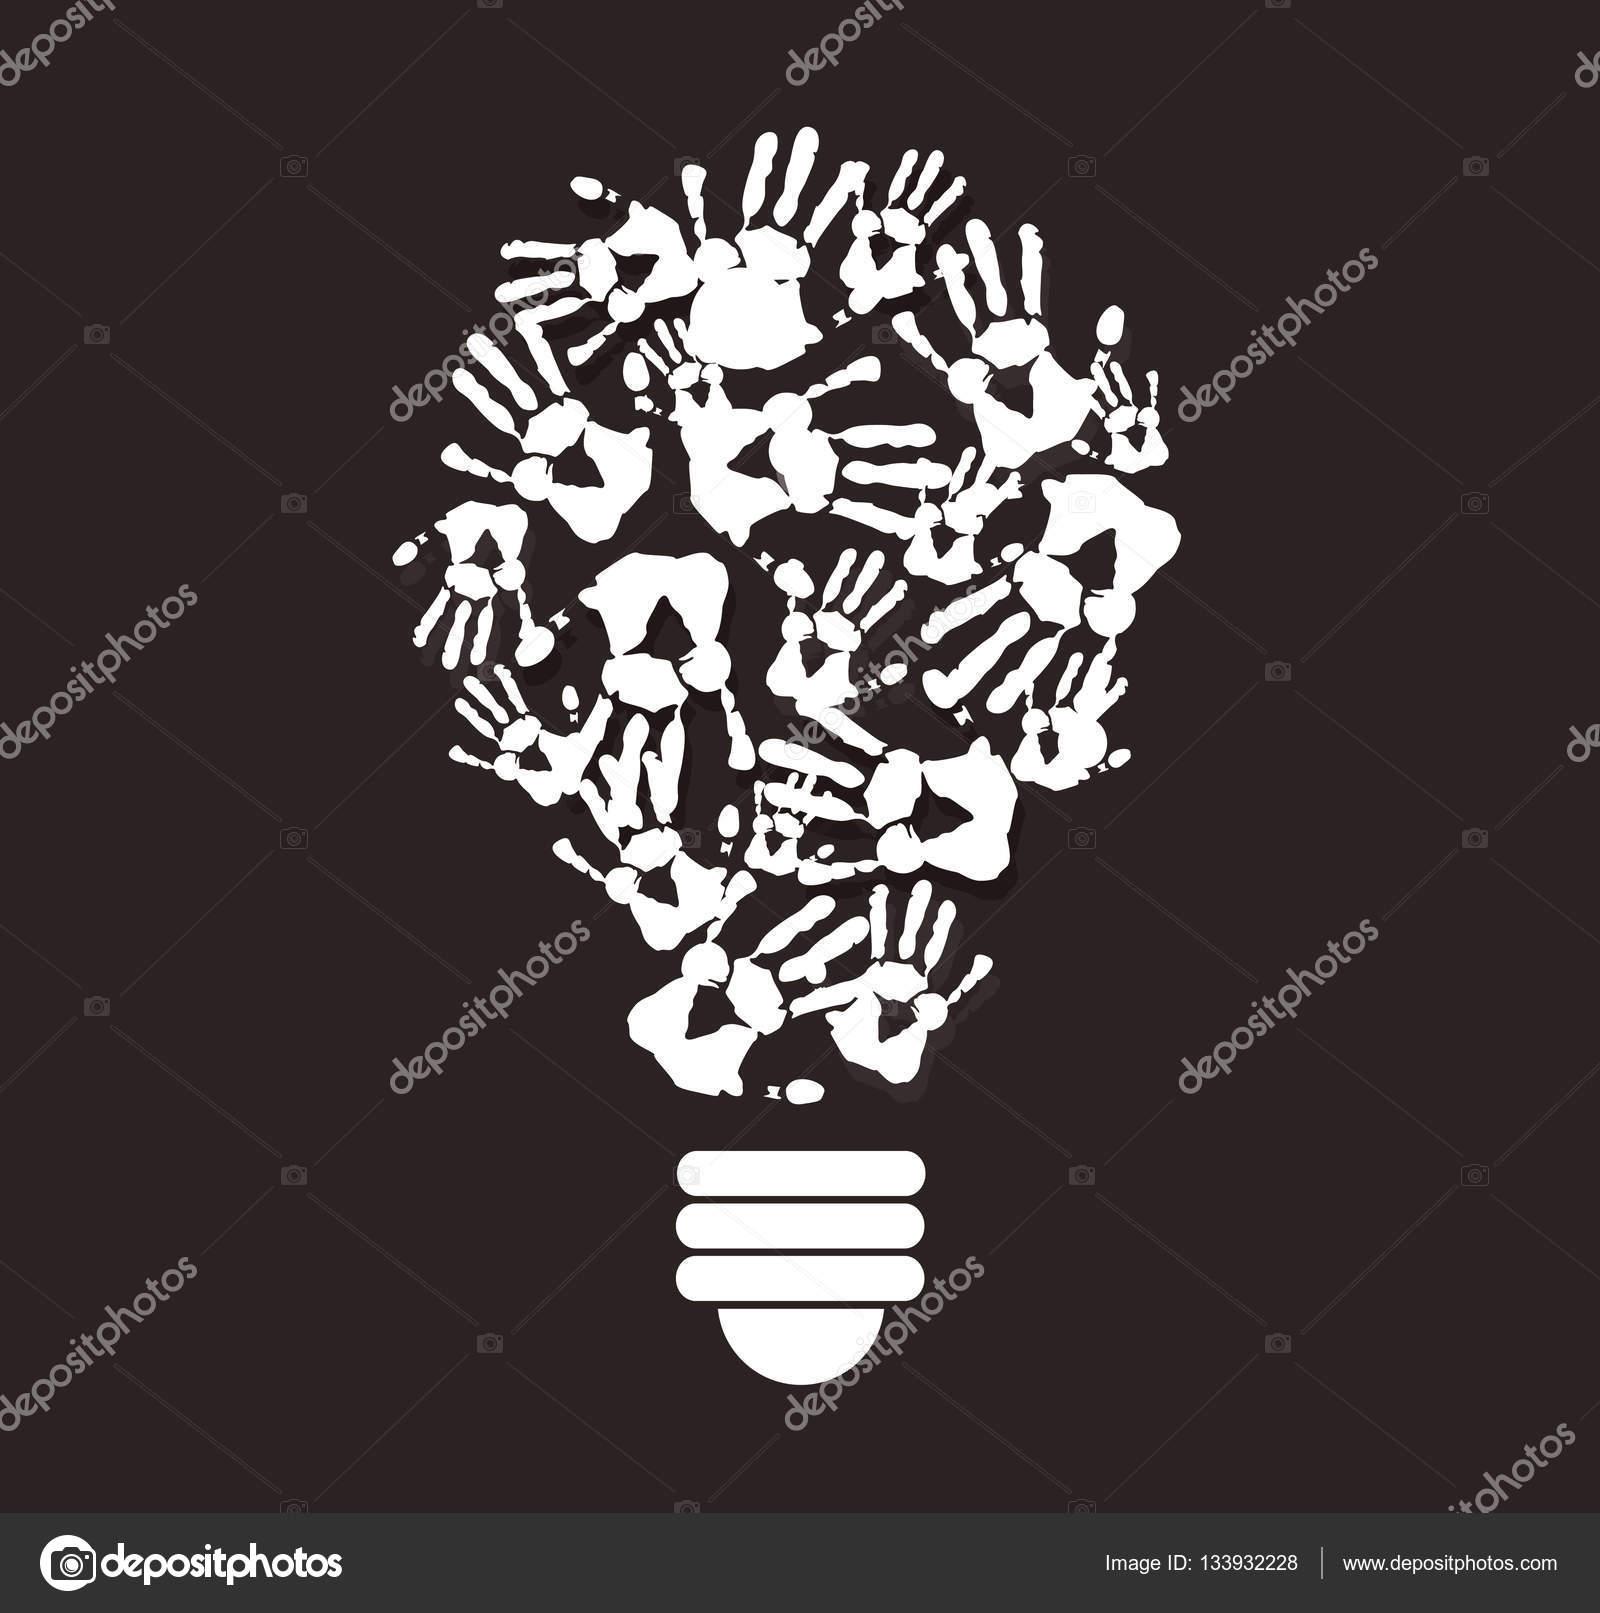 Colorful handprint in lightbulb shape symbol of thinking concept colorful handprint in lightbulb shape symbol of thinking concept stock vector biocorpaavc